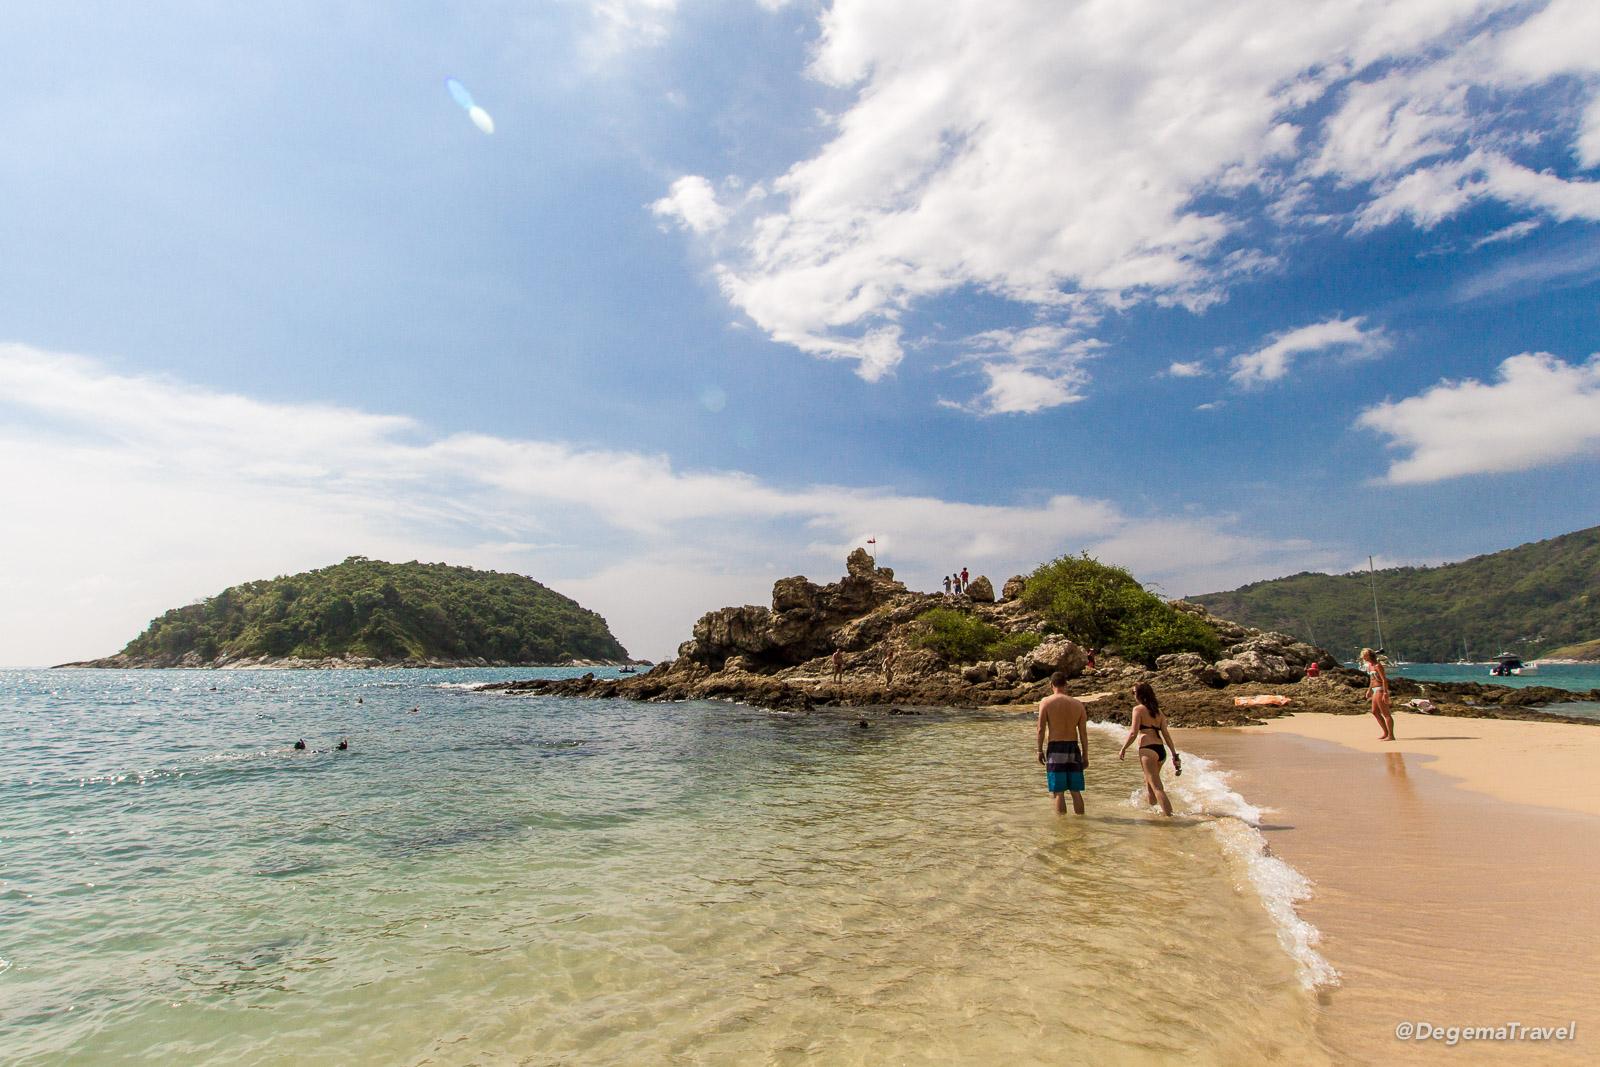 Ya Nui Beach in Phuket, Thailand